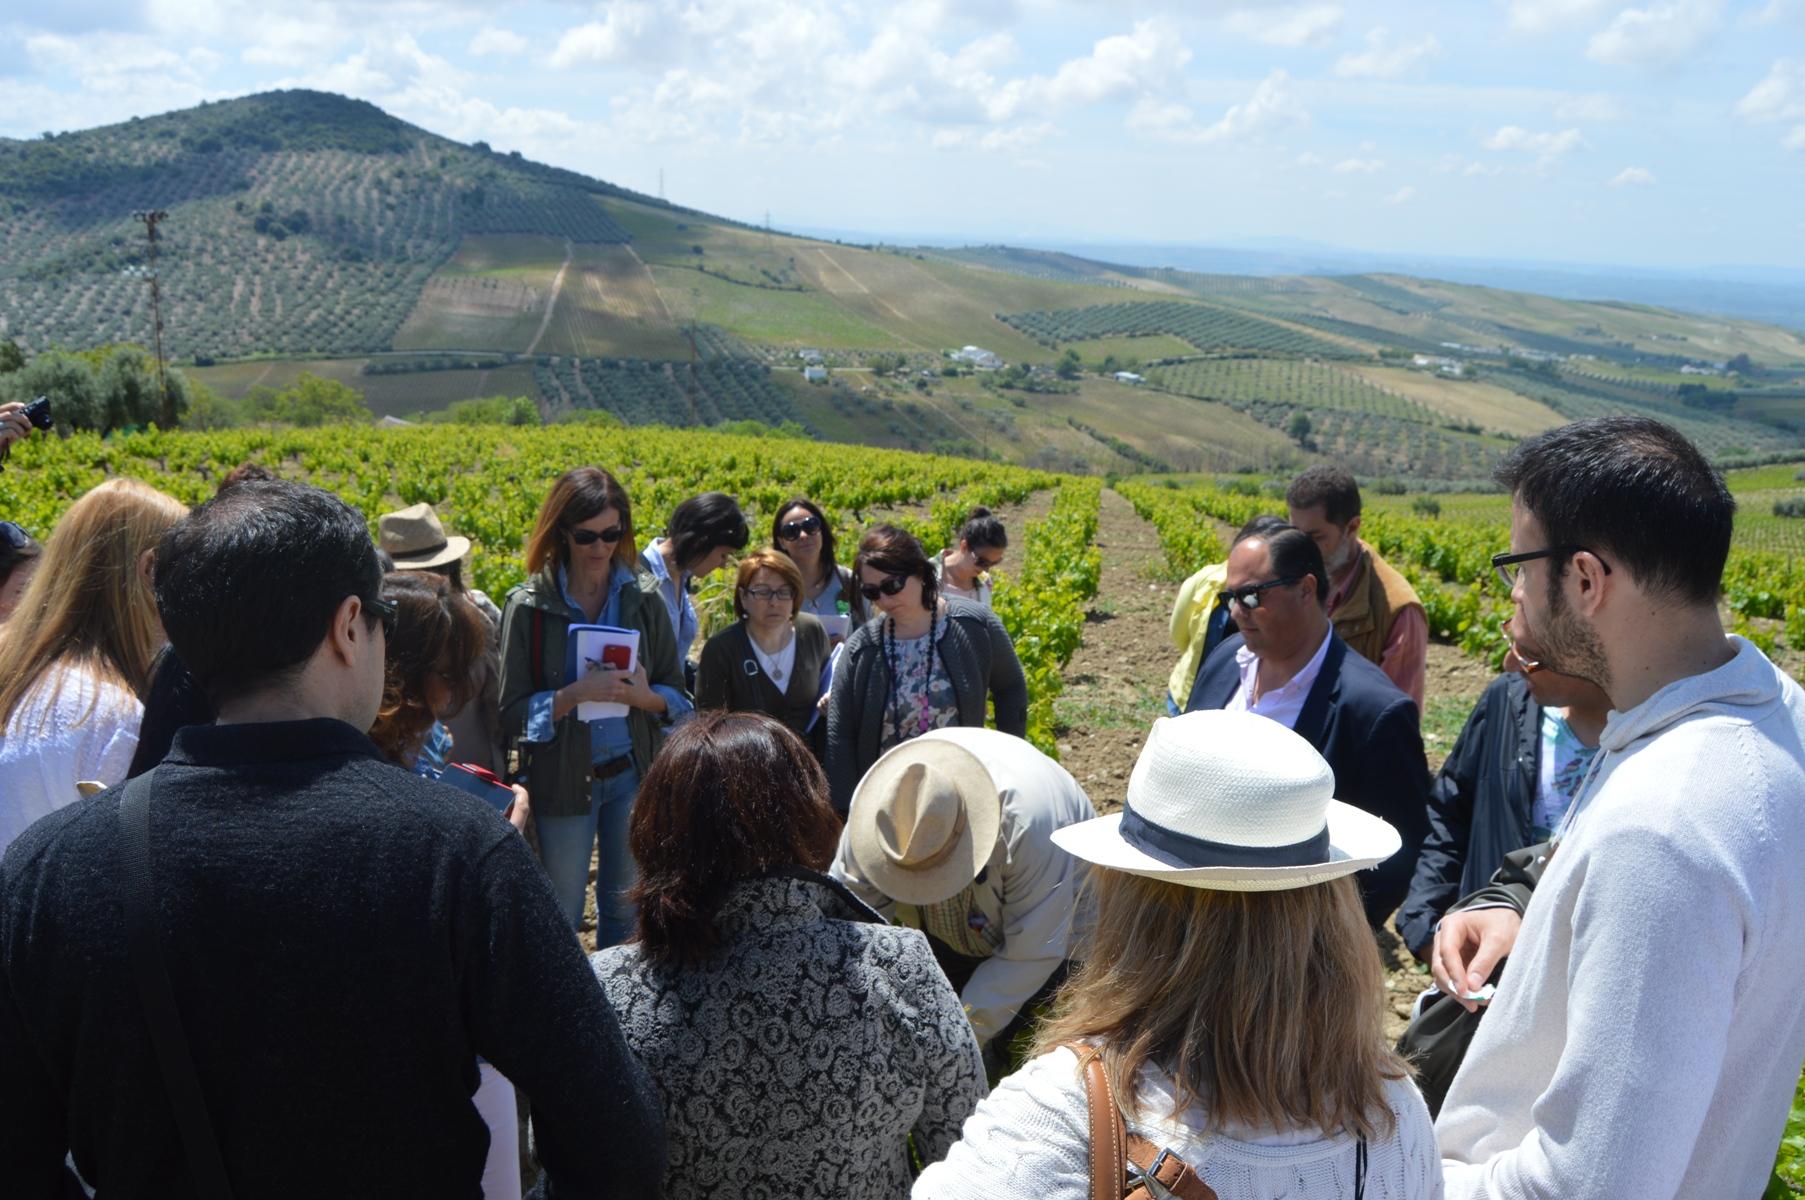 Grupo visita lagar blanco Sierra de Montilla